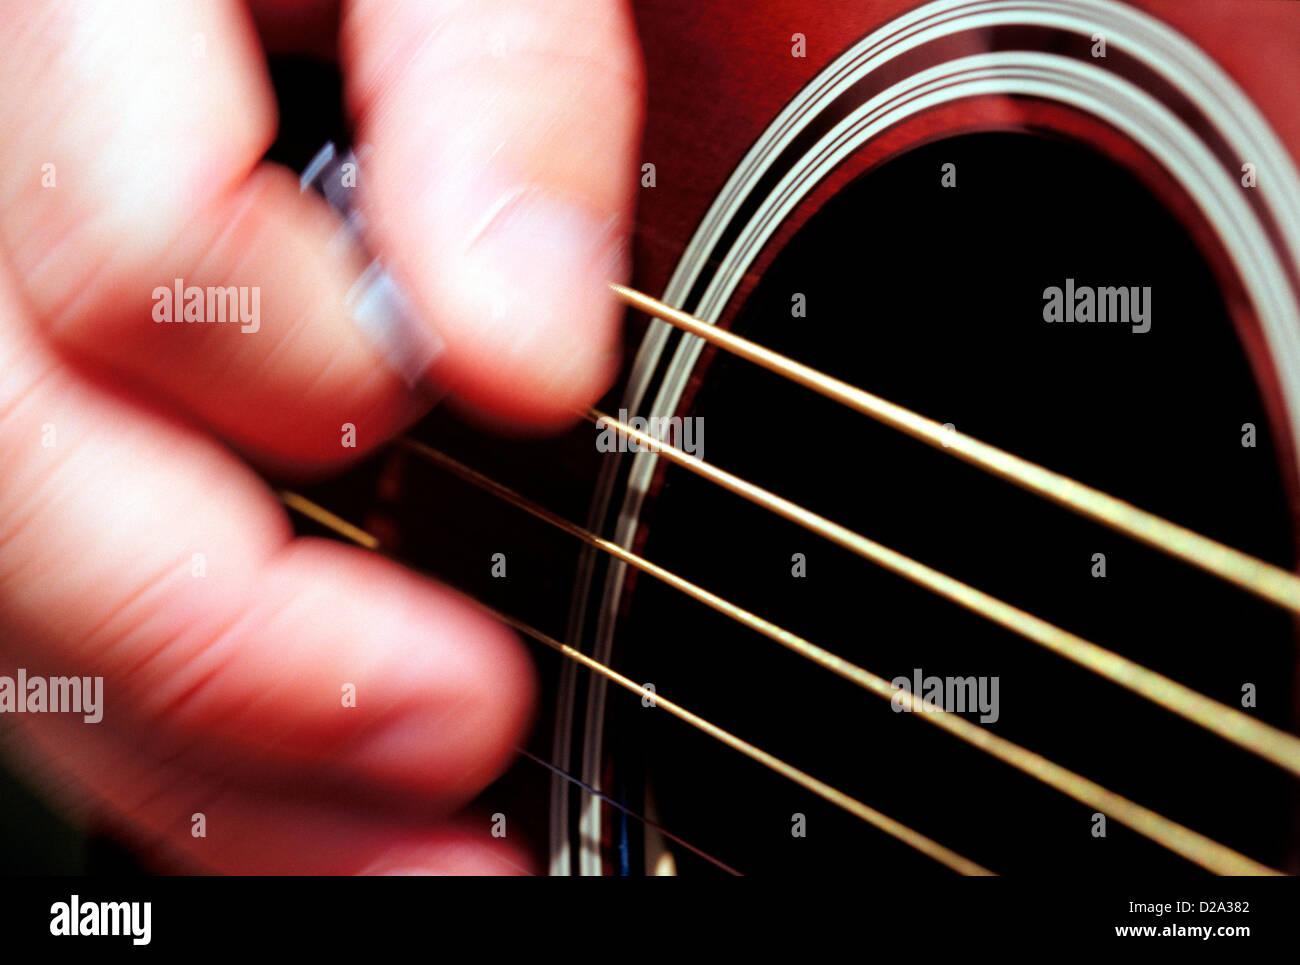 Close-Up Of Man'S Hand Strumming Guitar Strings - Stock Image